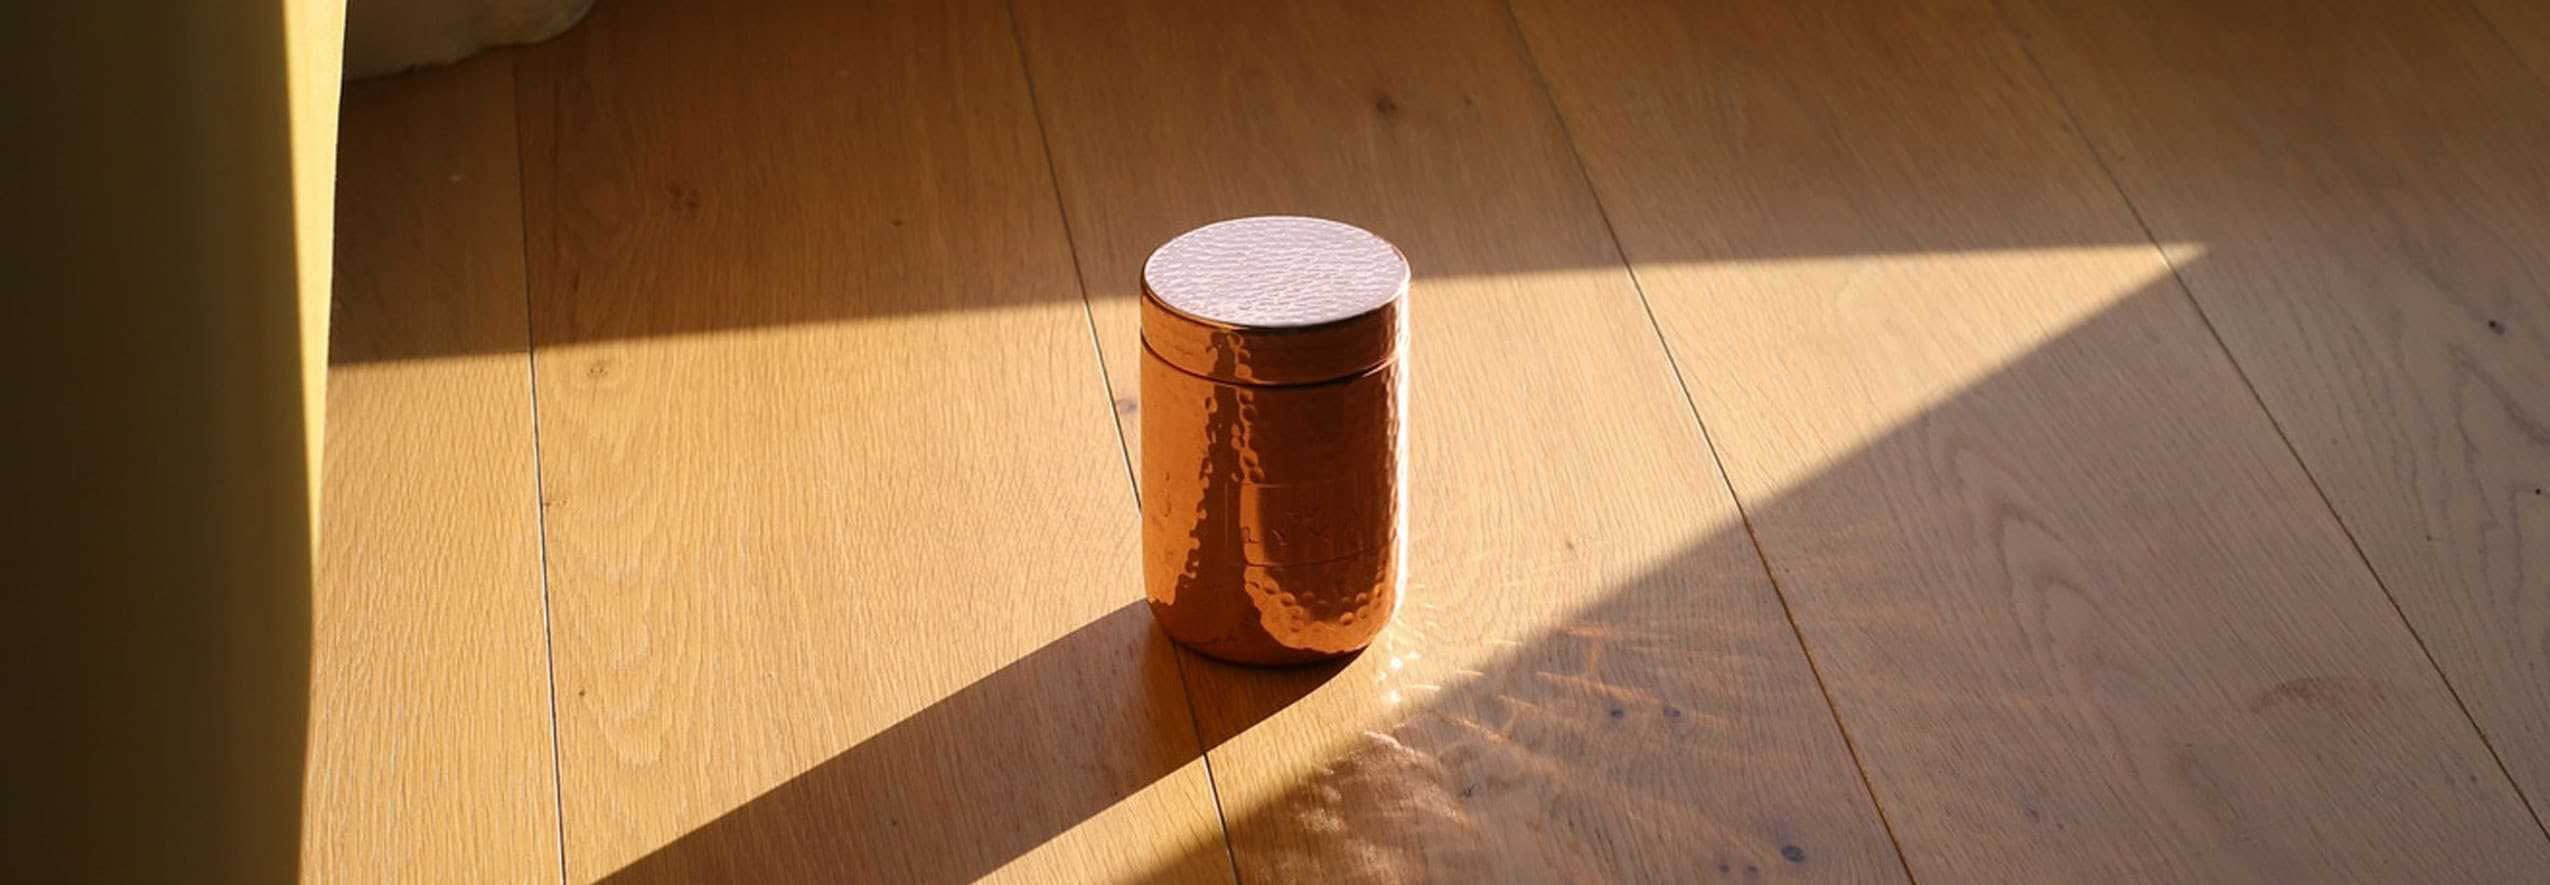 capsules on ray of sunshine